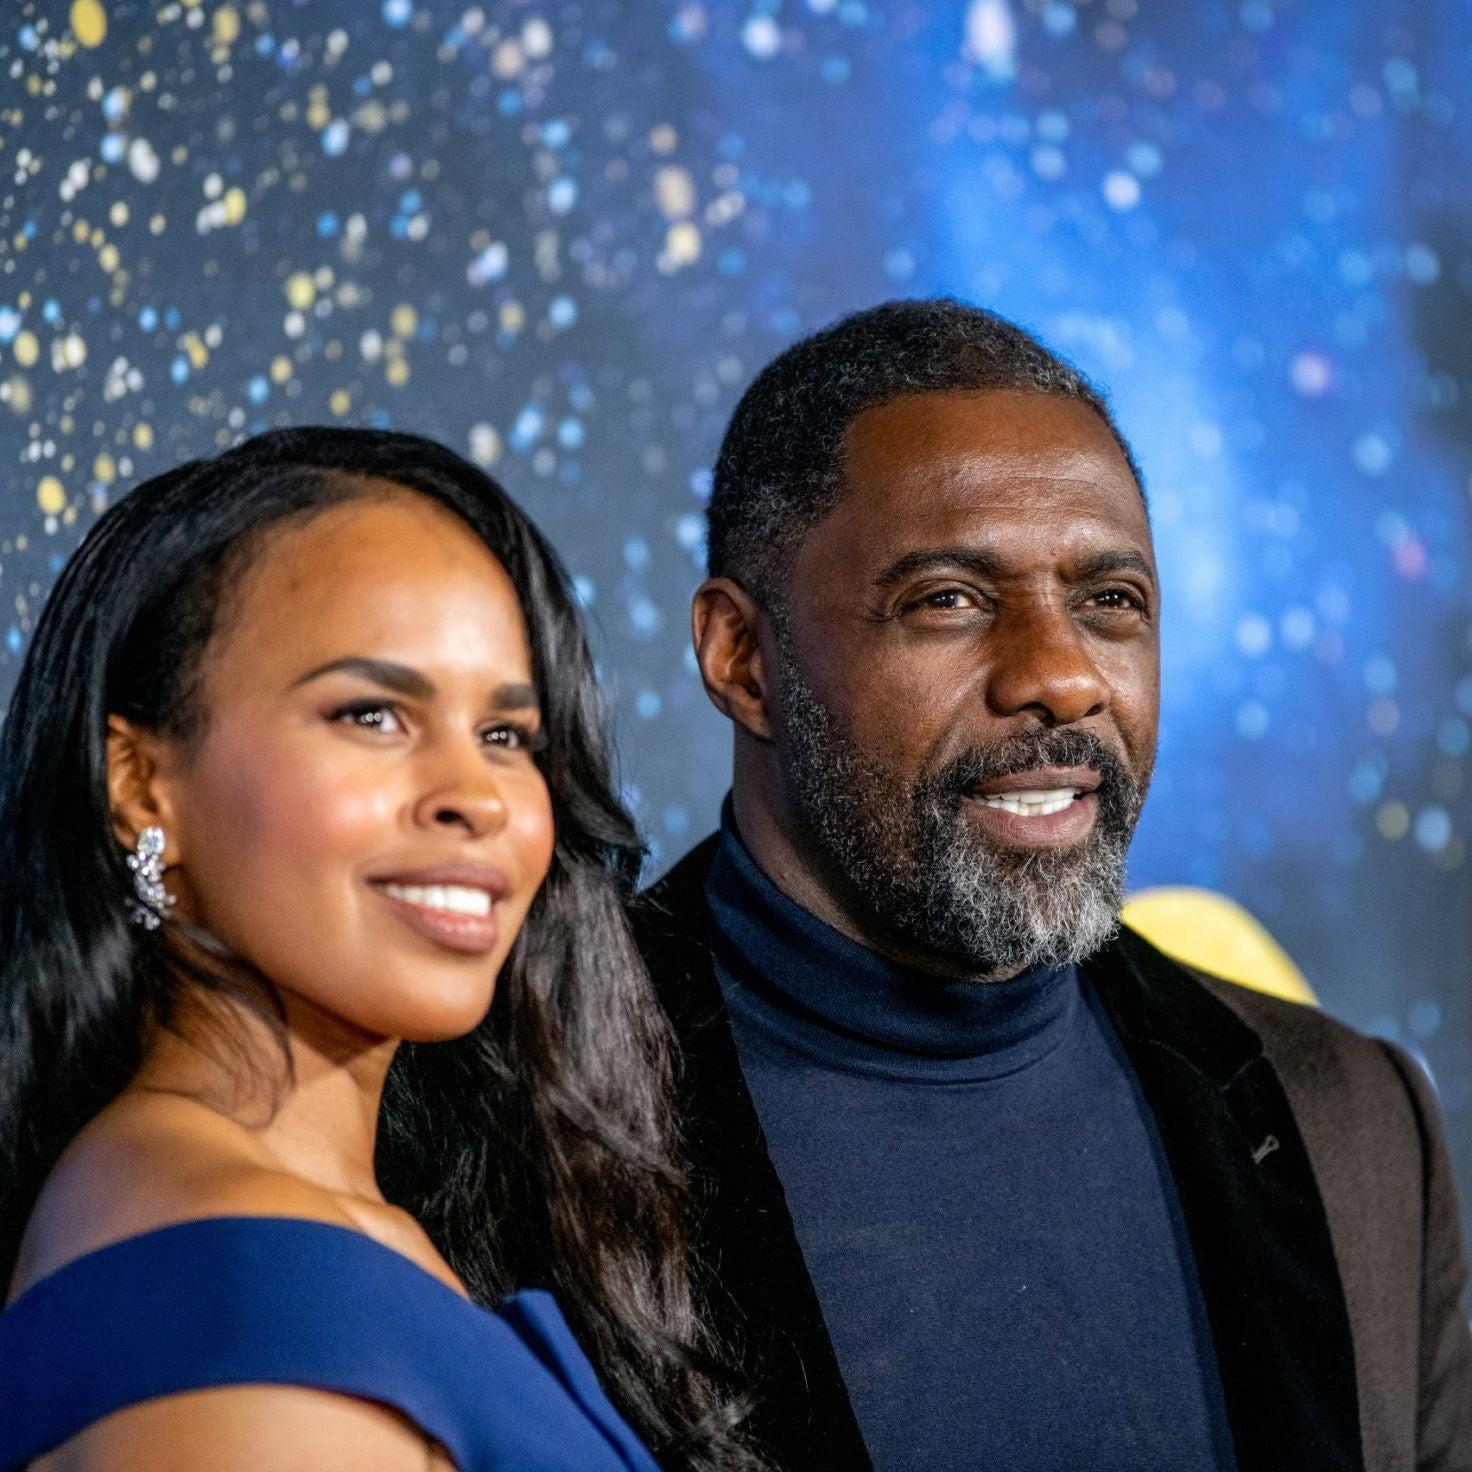 Idris Elba And Wife Sabrina Share Coronavirus Update With Fans